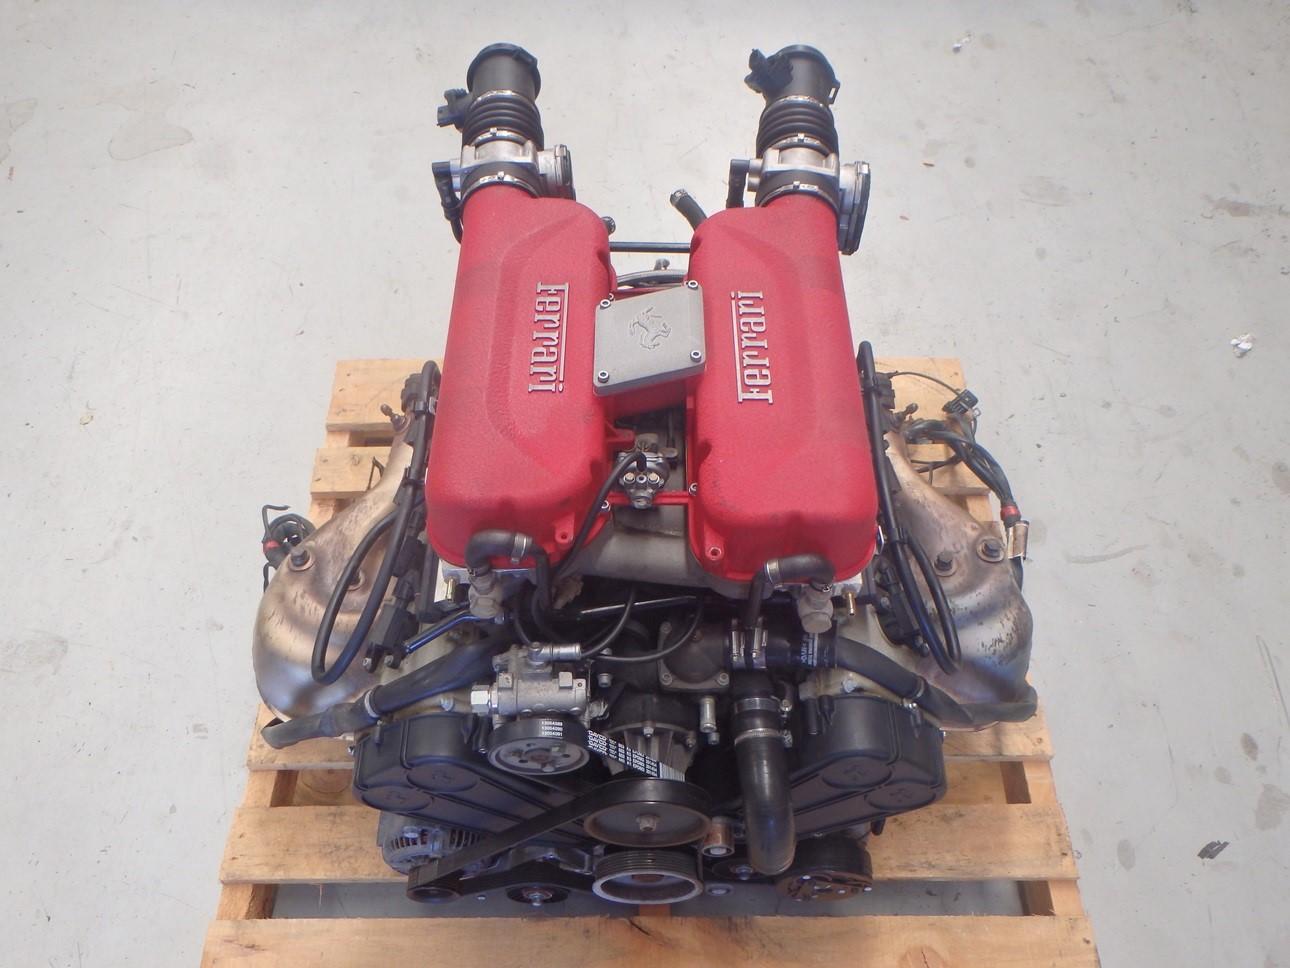 Details About Ferrari 360 Modena V8 F131 Complete Engine Motor All Accessories Loom Ecu J079